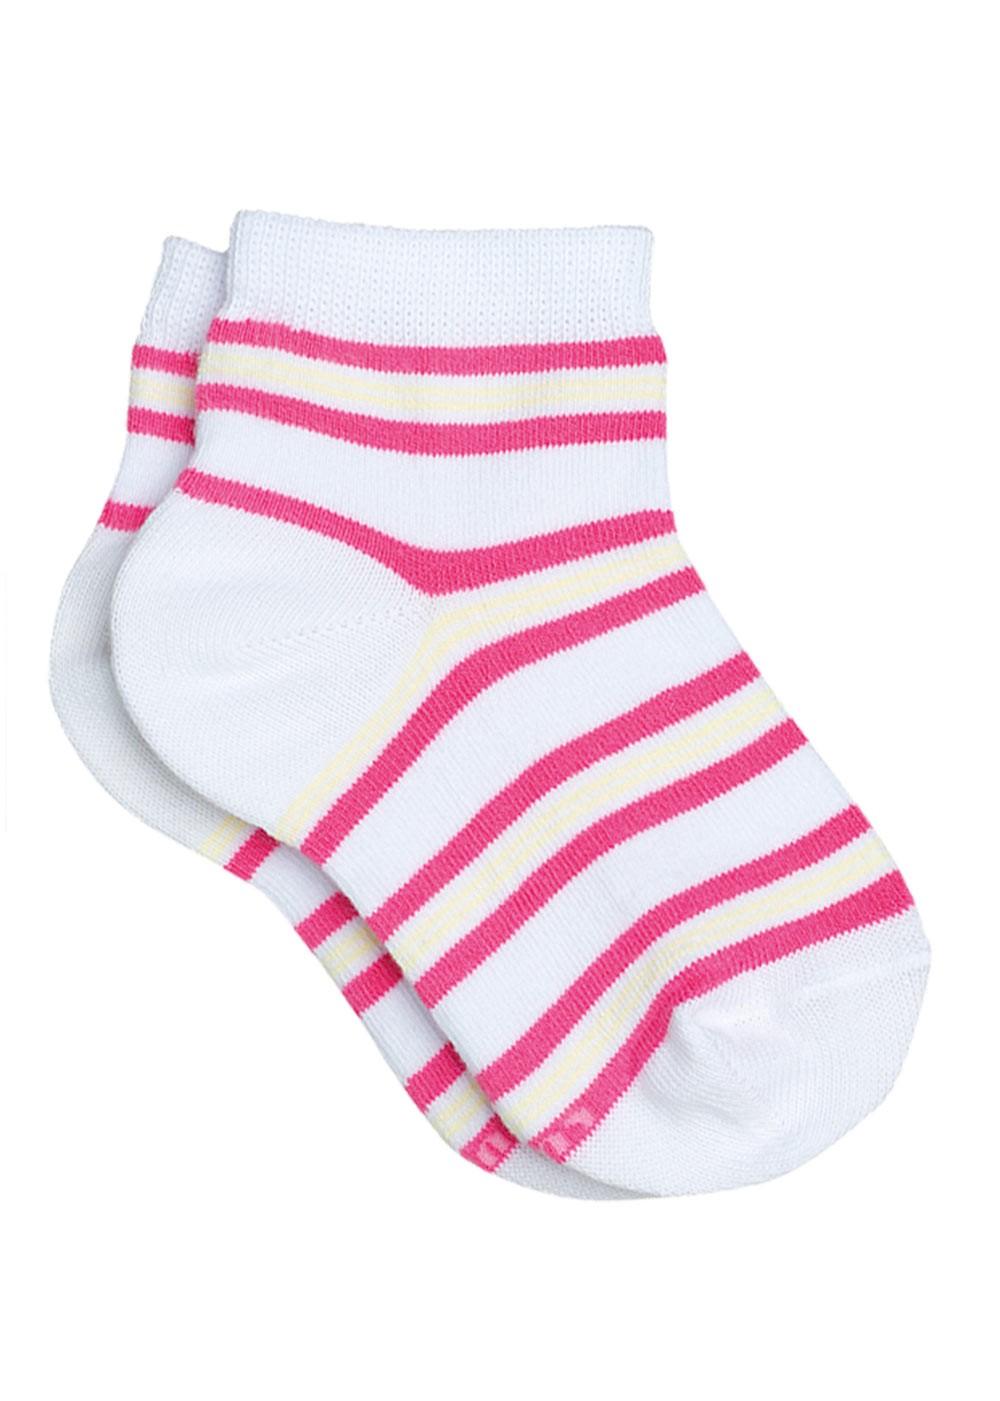 Meia com Cano Infantil Feminina Kit 3 Rosa Listrada Lupo